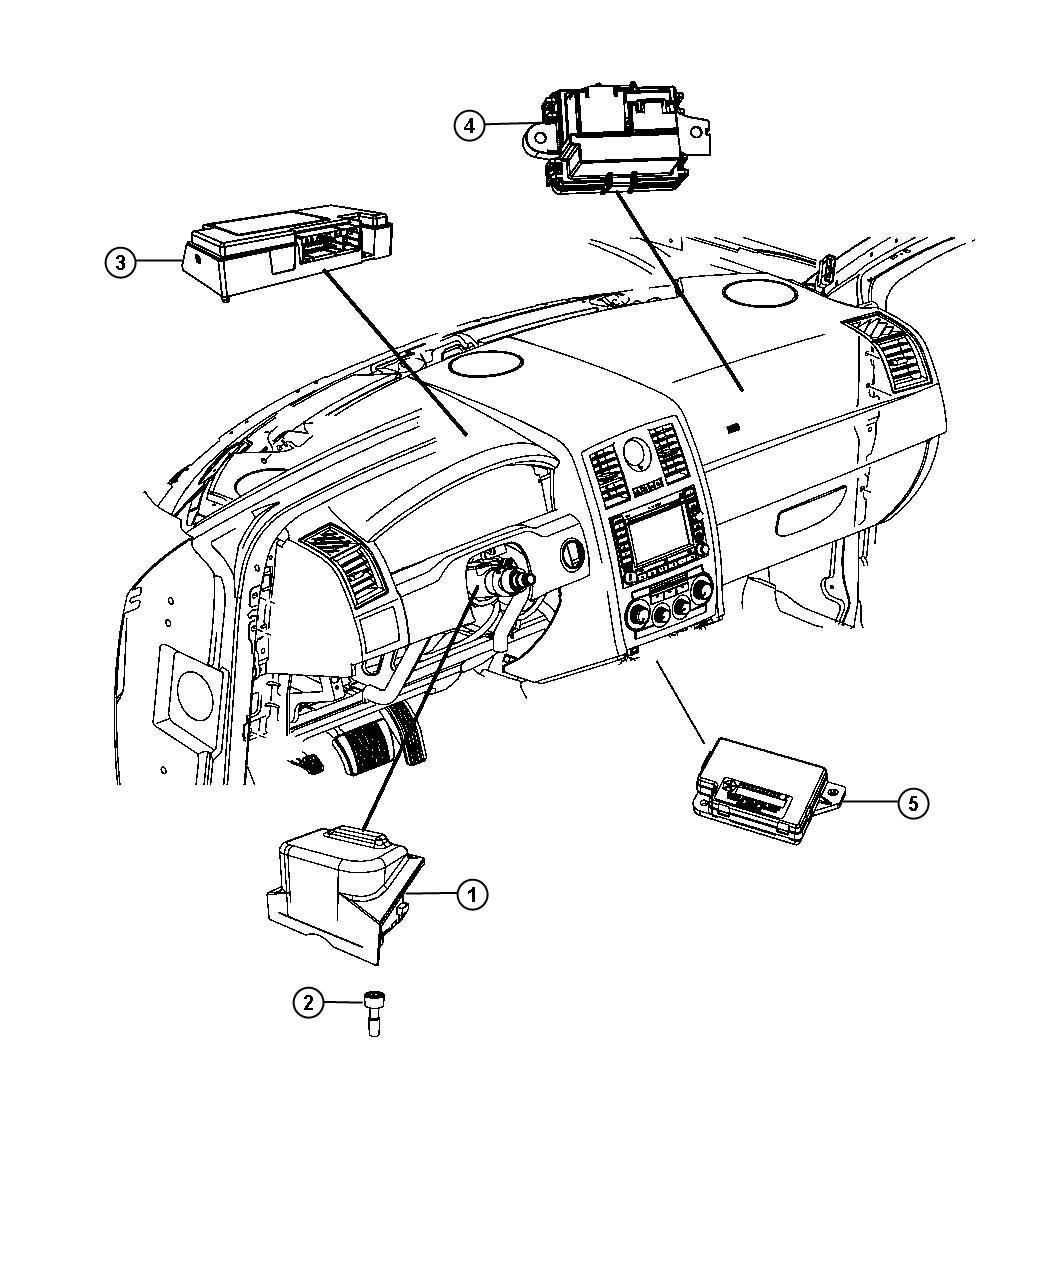 Chrysler 300 Module Telematics Hfm Those